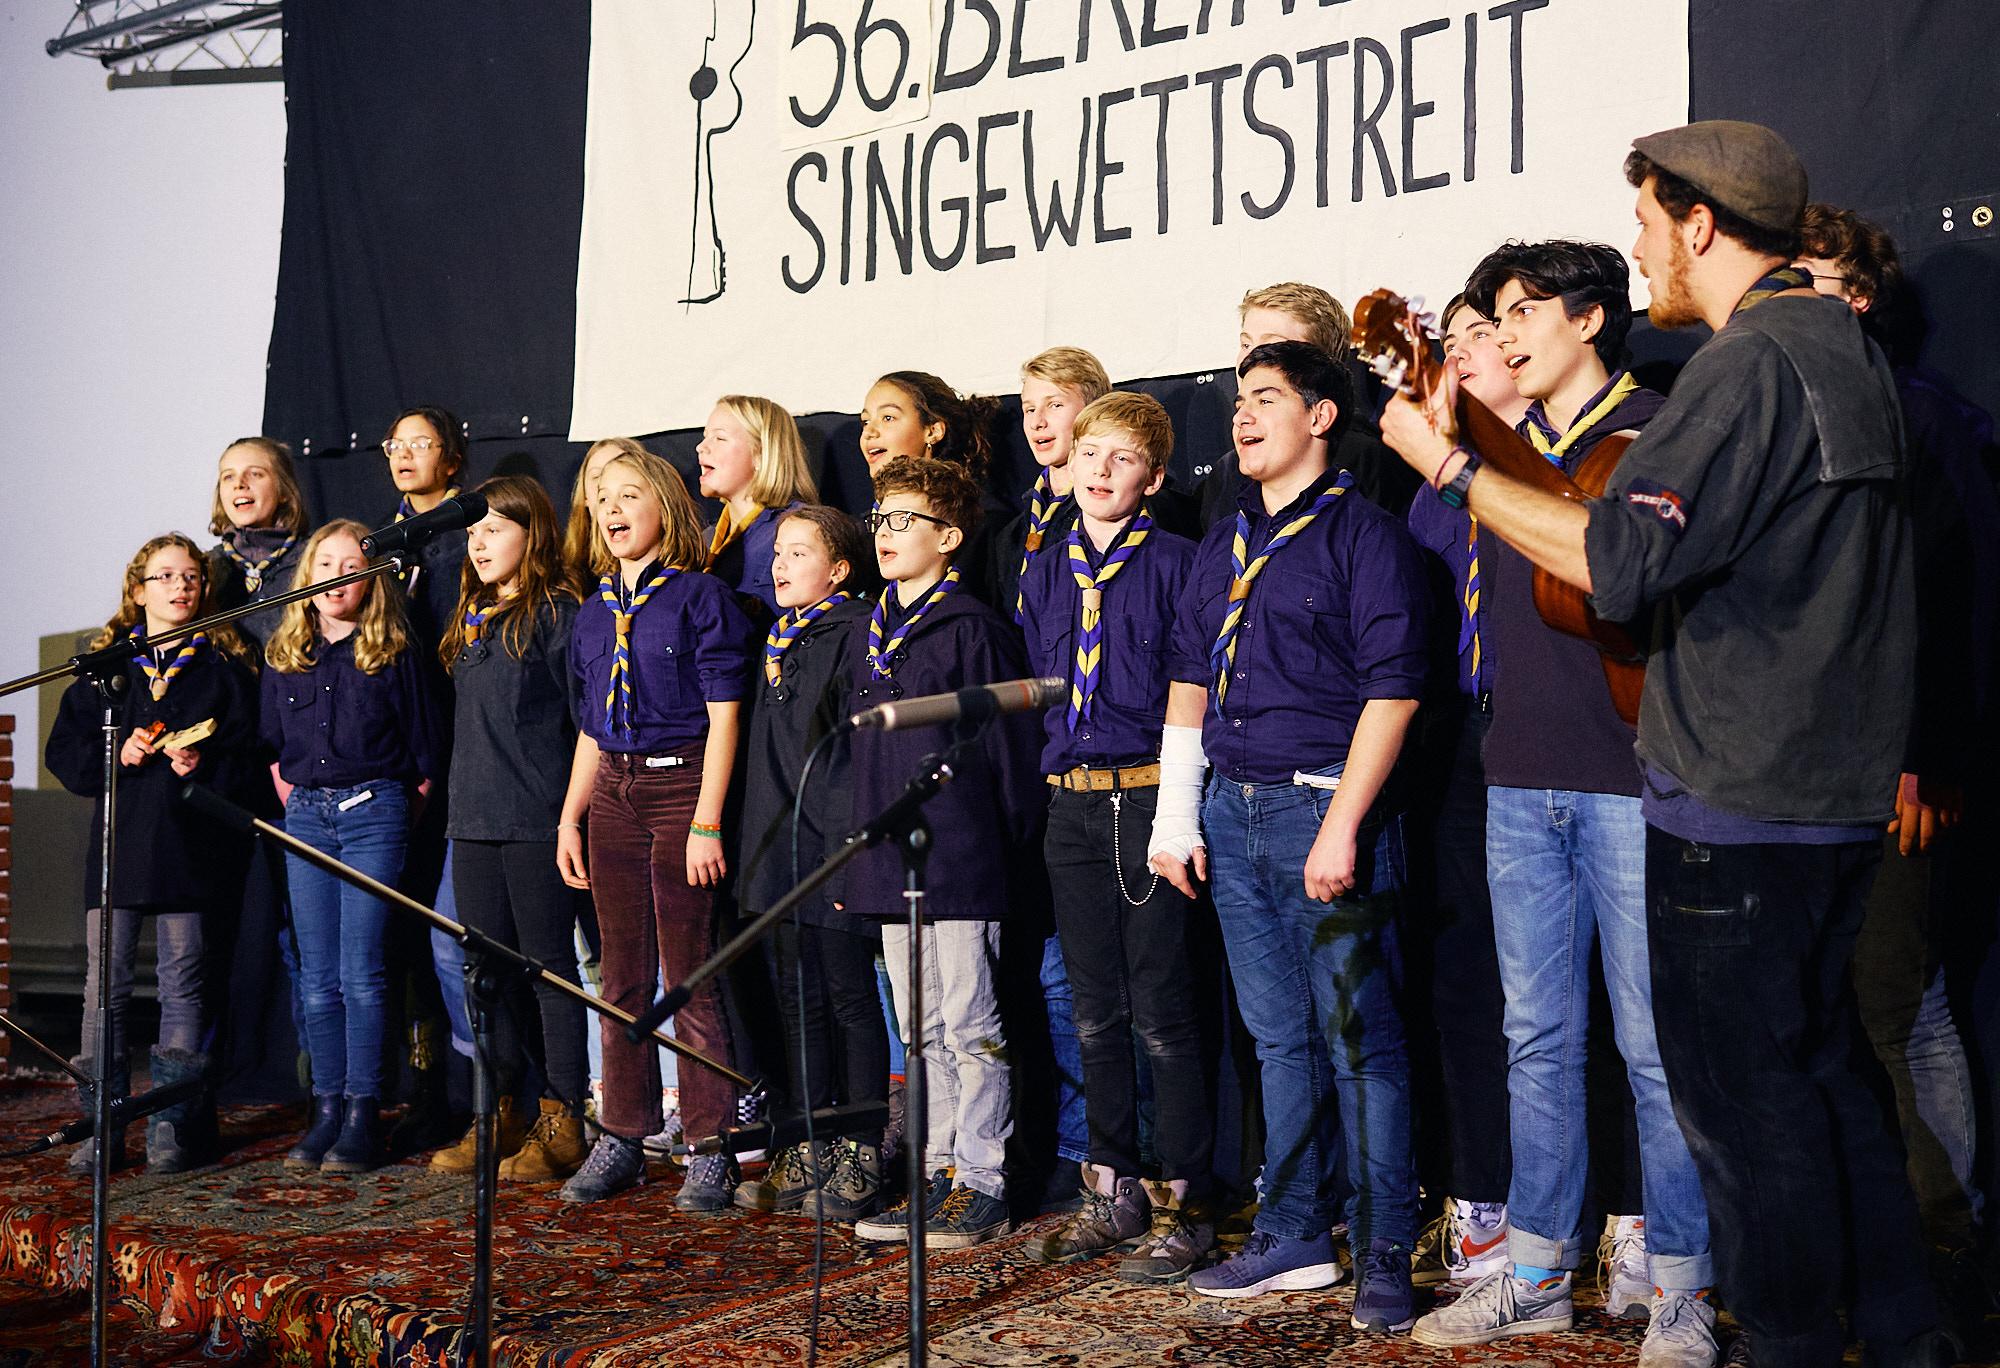 Berliner Singewettstreit 2019